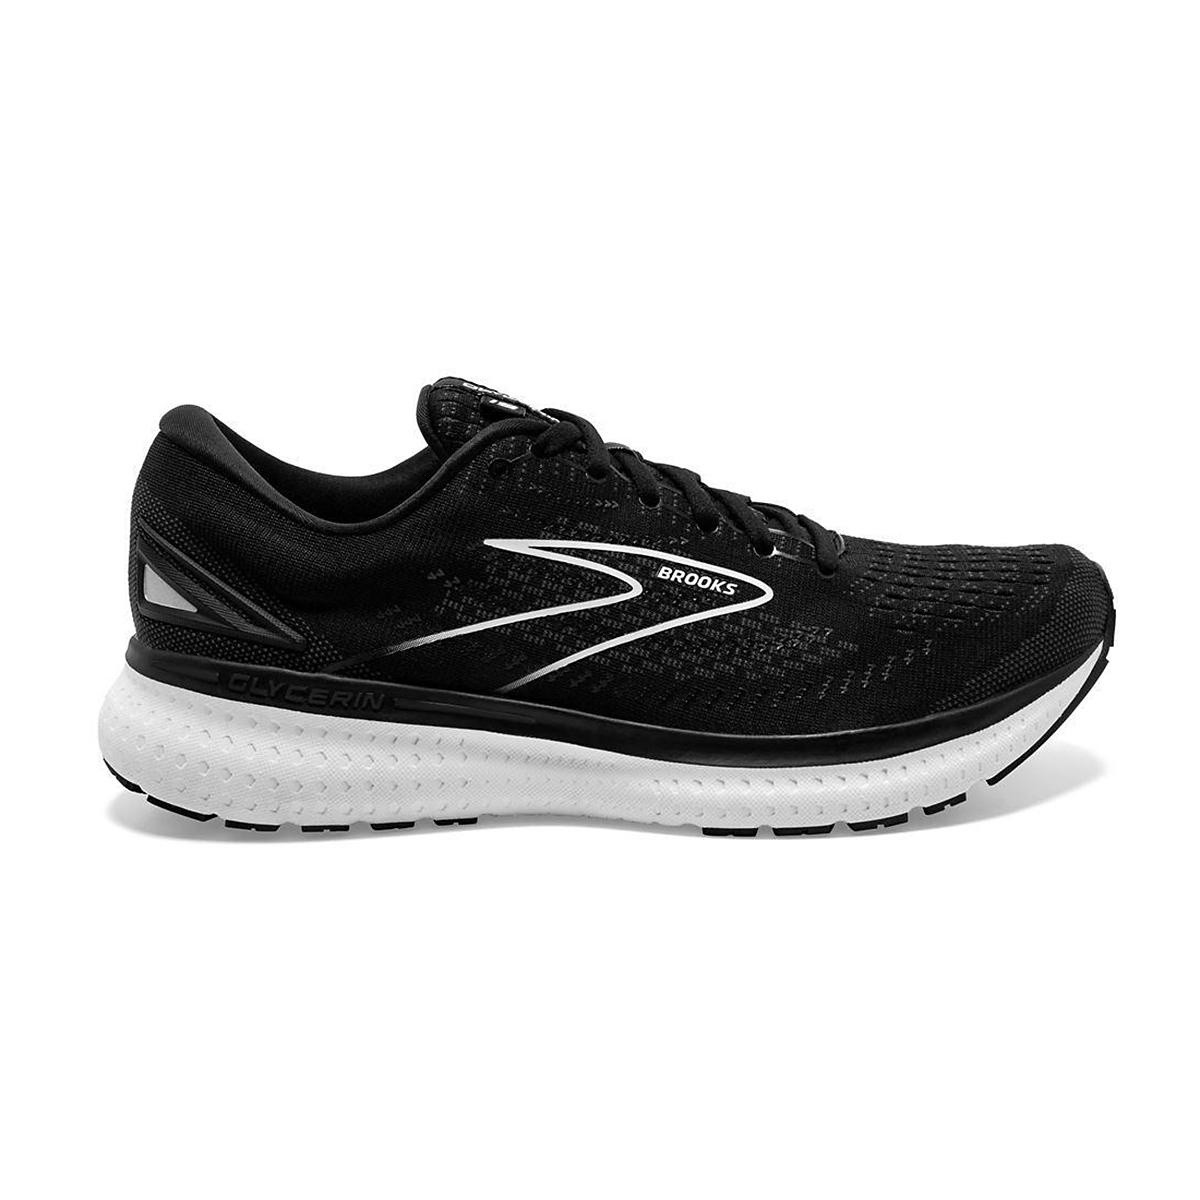 Women's Brooks Glycerin 19 Running Shoe - Color: Black/White - Size: 5 - Width: Regular, Black/White, large, image 1